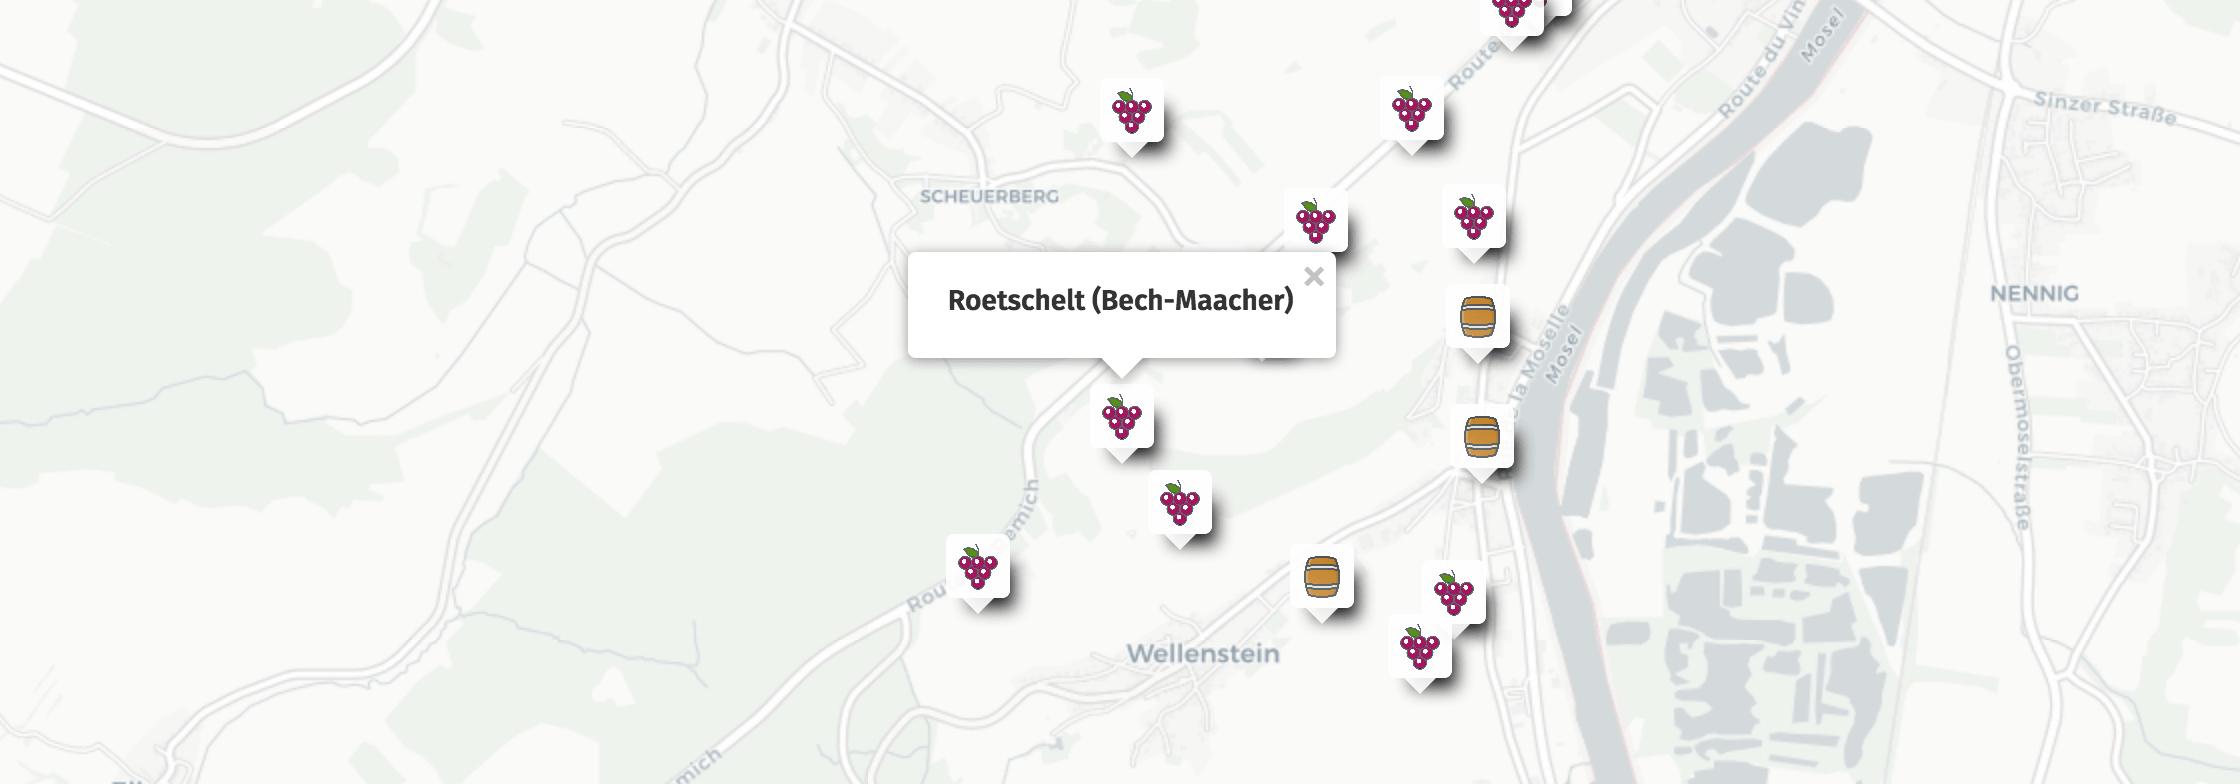 Geolocalisation des vins du Roetschelt à Bech-Kleinmacher